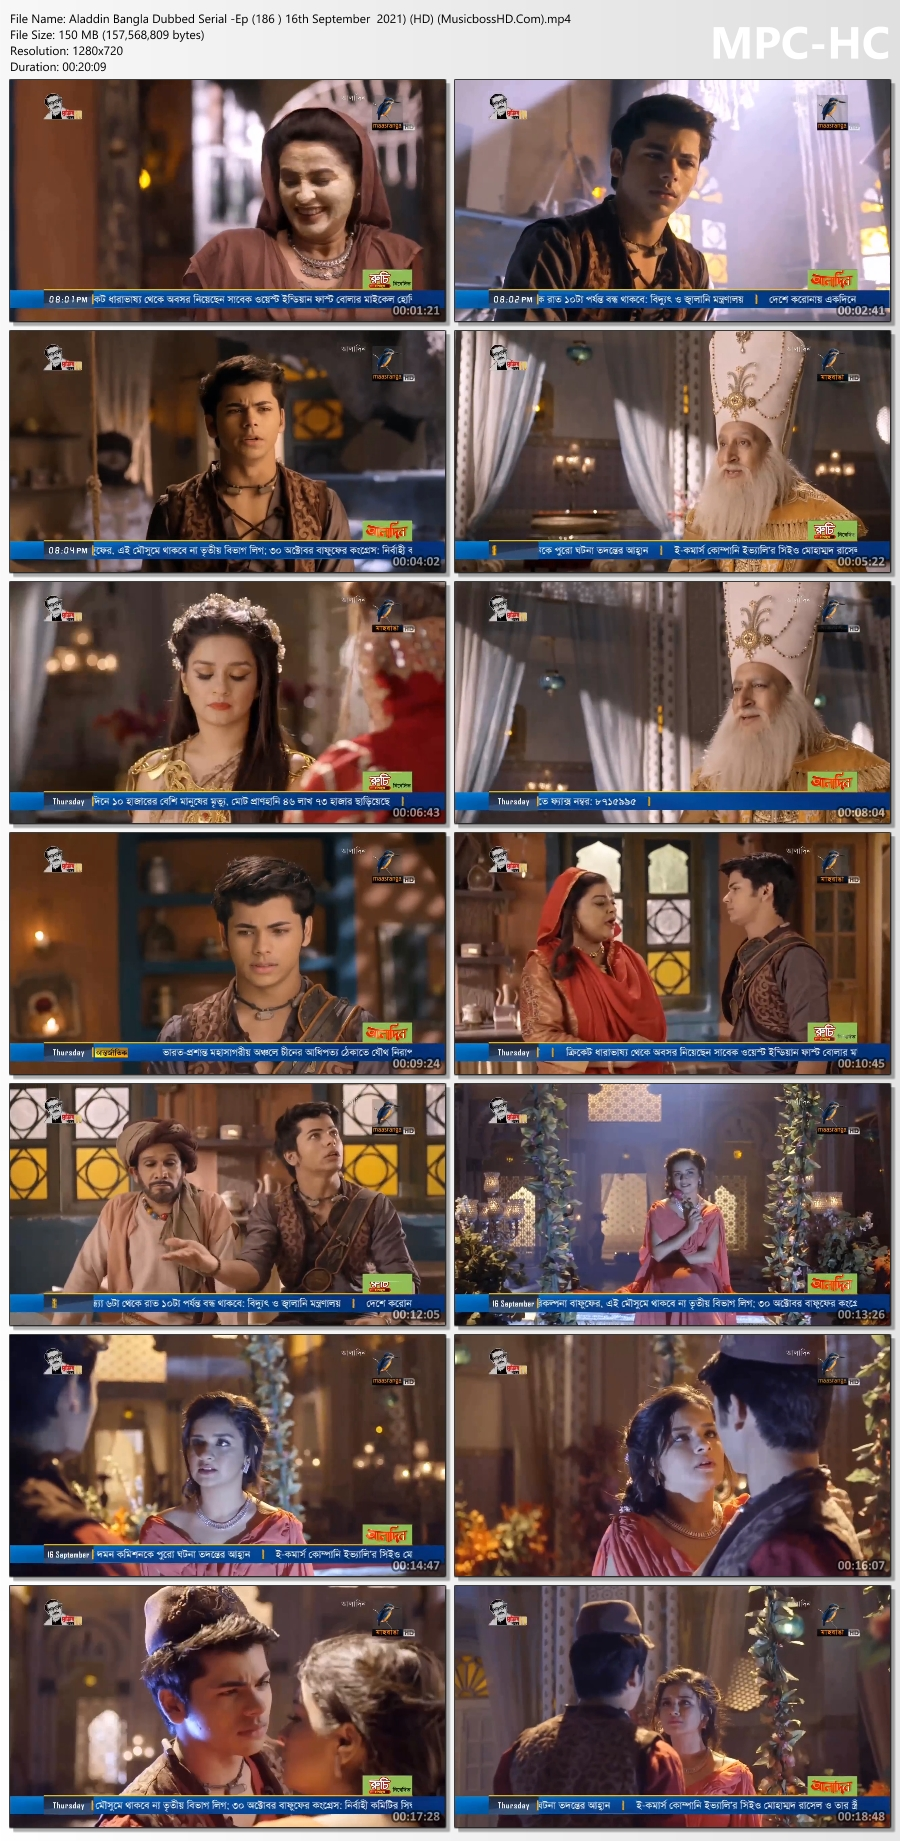 Aladdin-Bangla-Dubbed-Serial-Ep-186-16th-September-2021-HD-Musicboss-HD-Com-mp4-thumbs